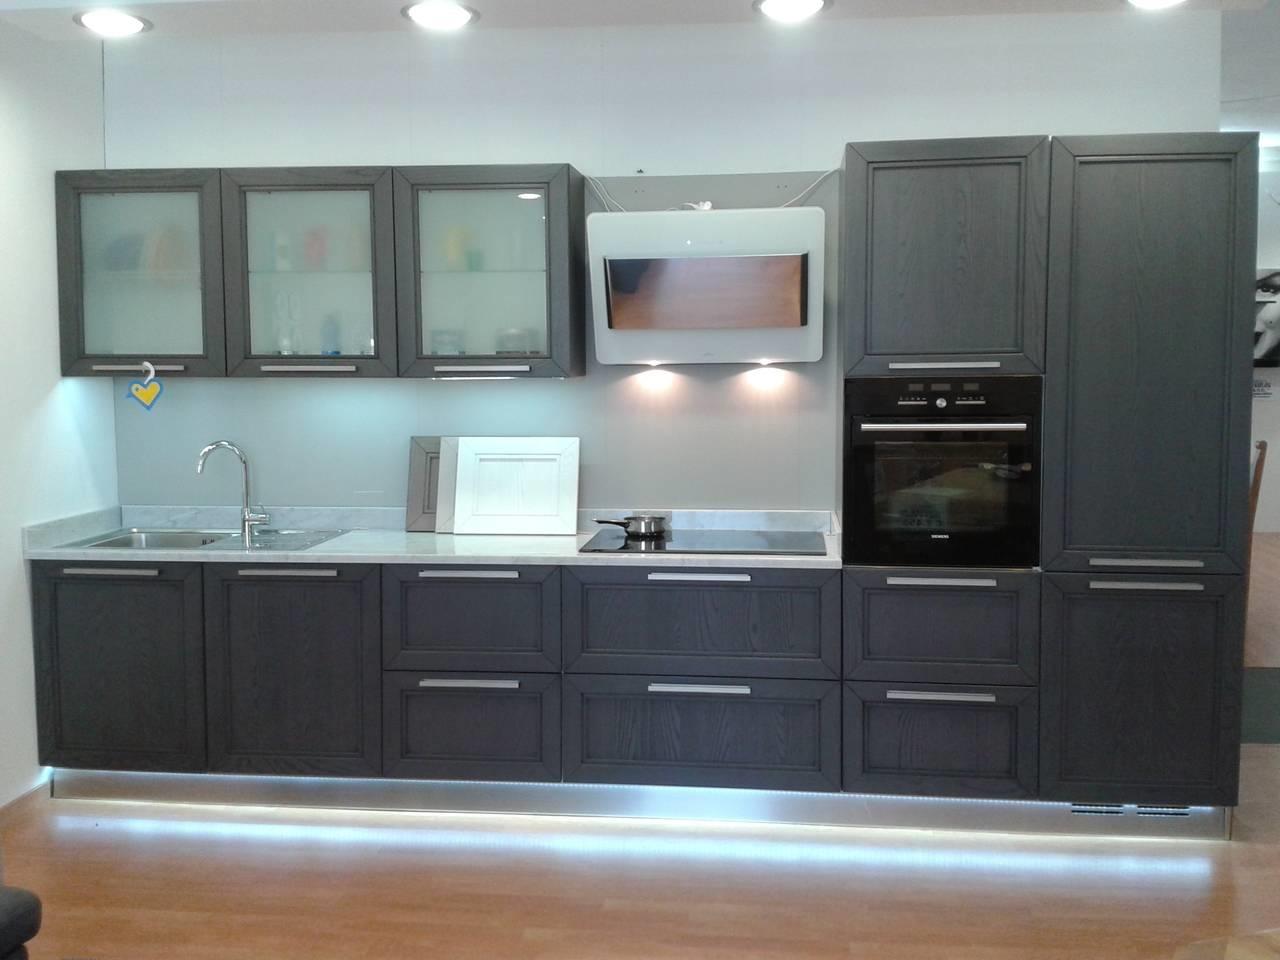 Cucina arredo3 itaca scontato del 60 cucine a prezzi - Cucina lineare 3 metri senza frigo ...